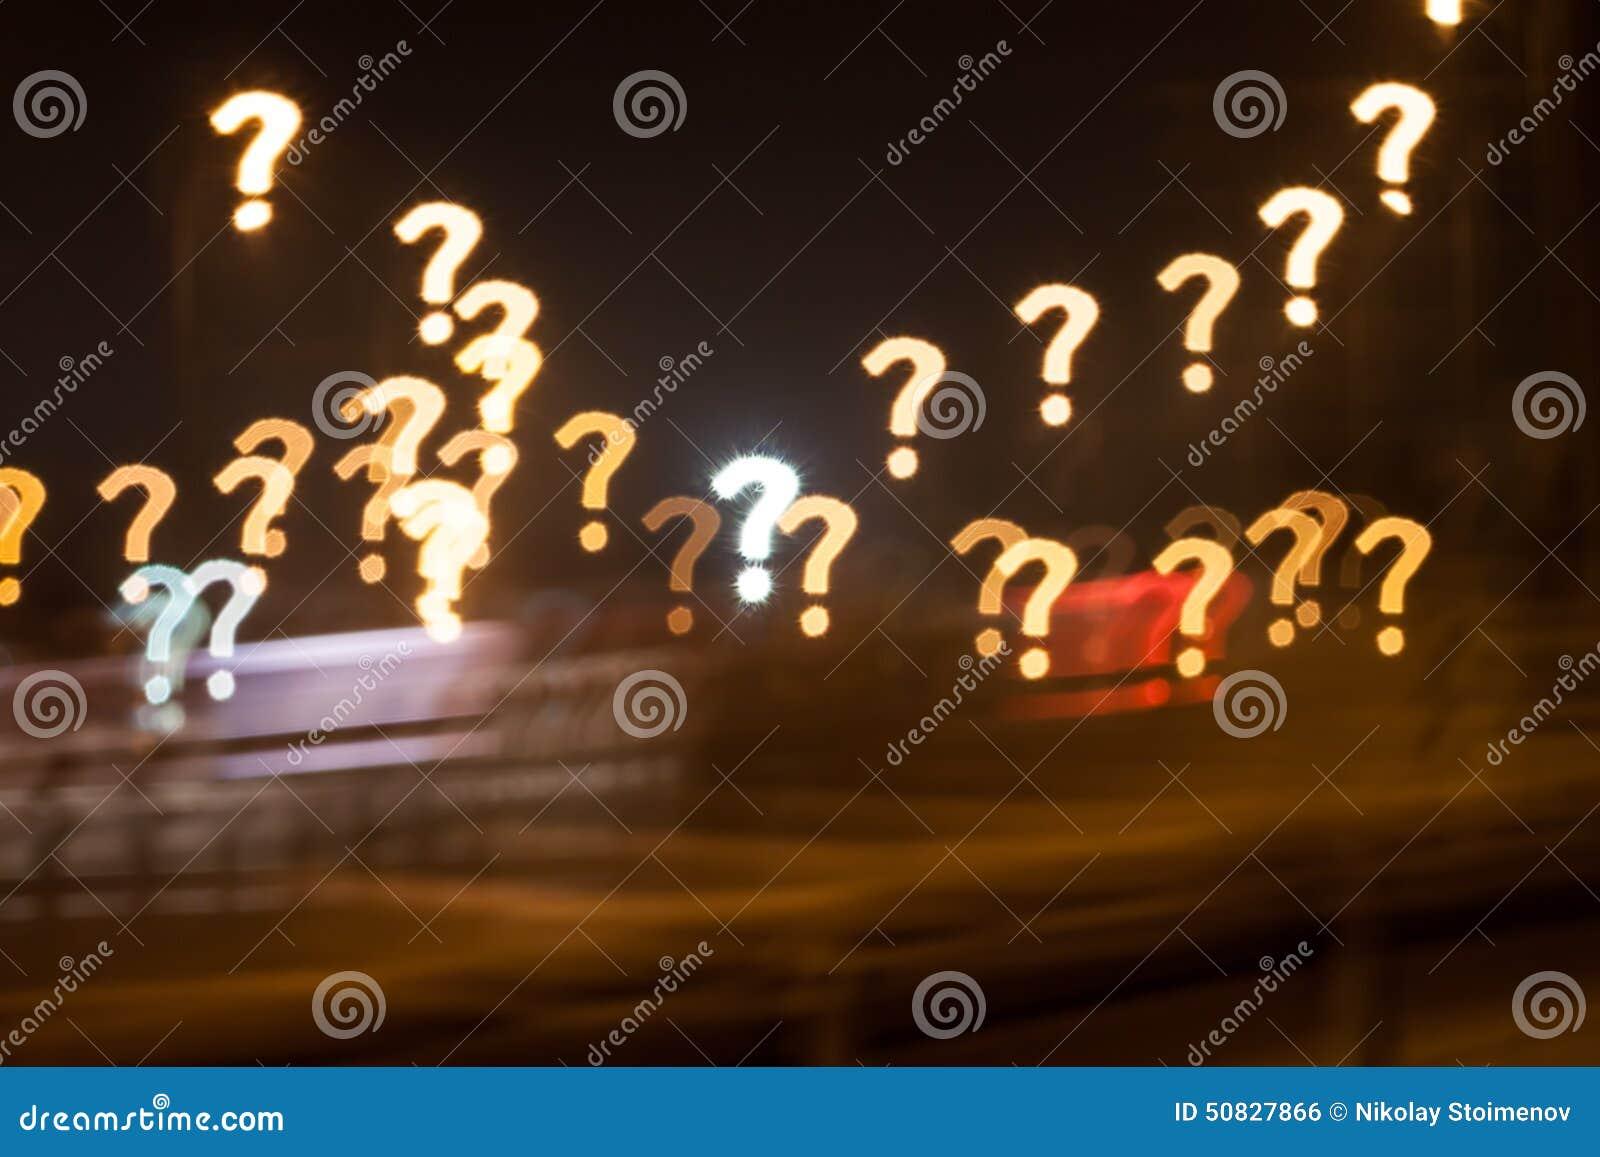 Question Mark Bokeh Stock Photo Image Of Custom 50827866 Christmas Lights On A T Qustom City Street